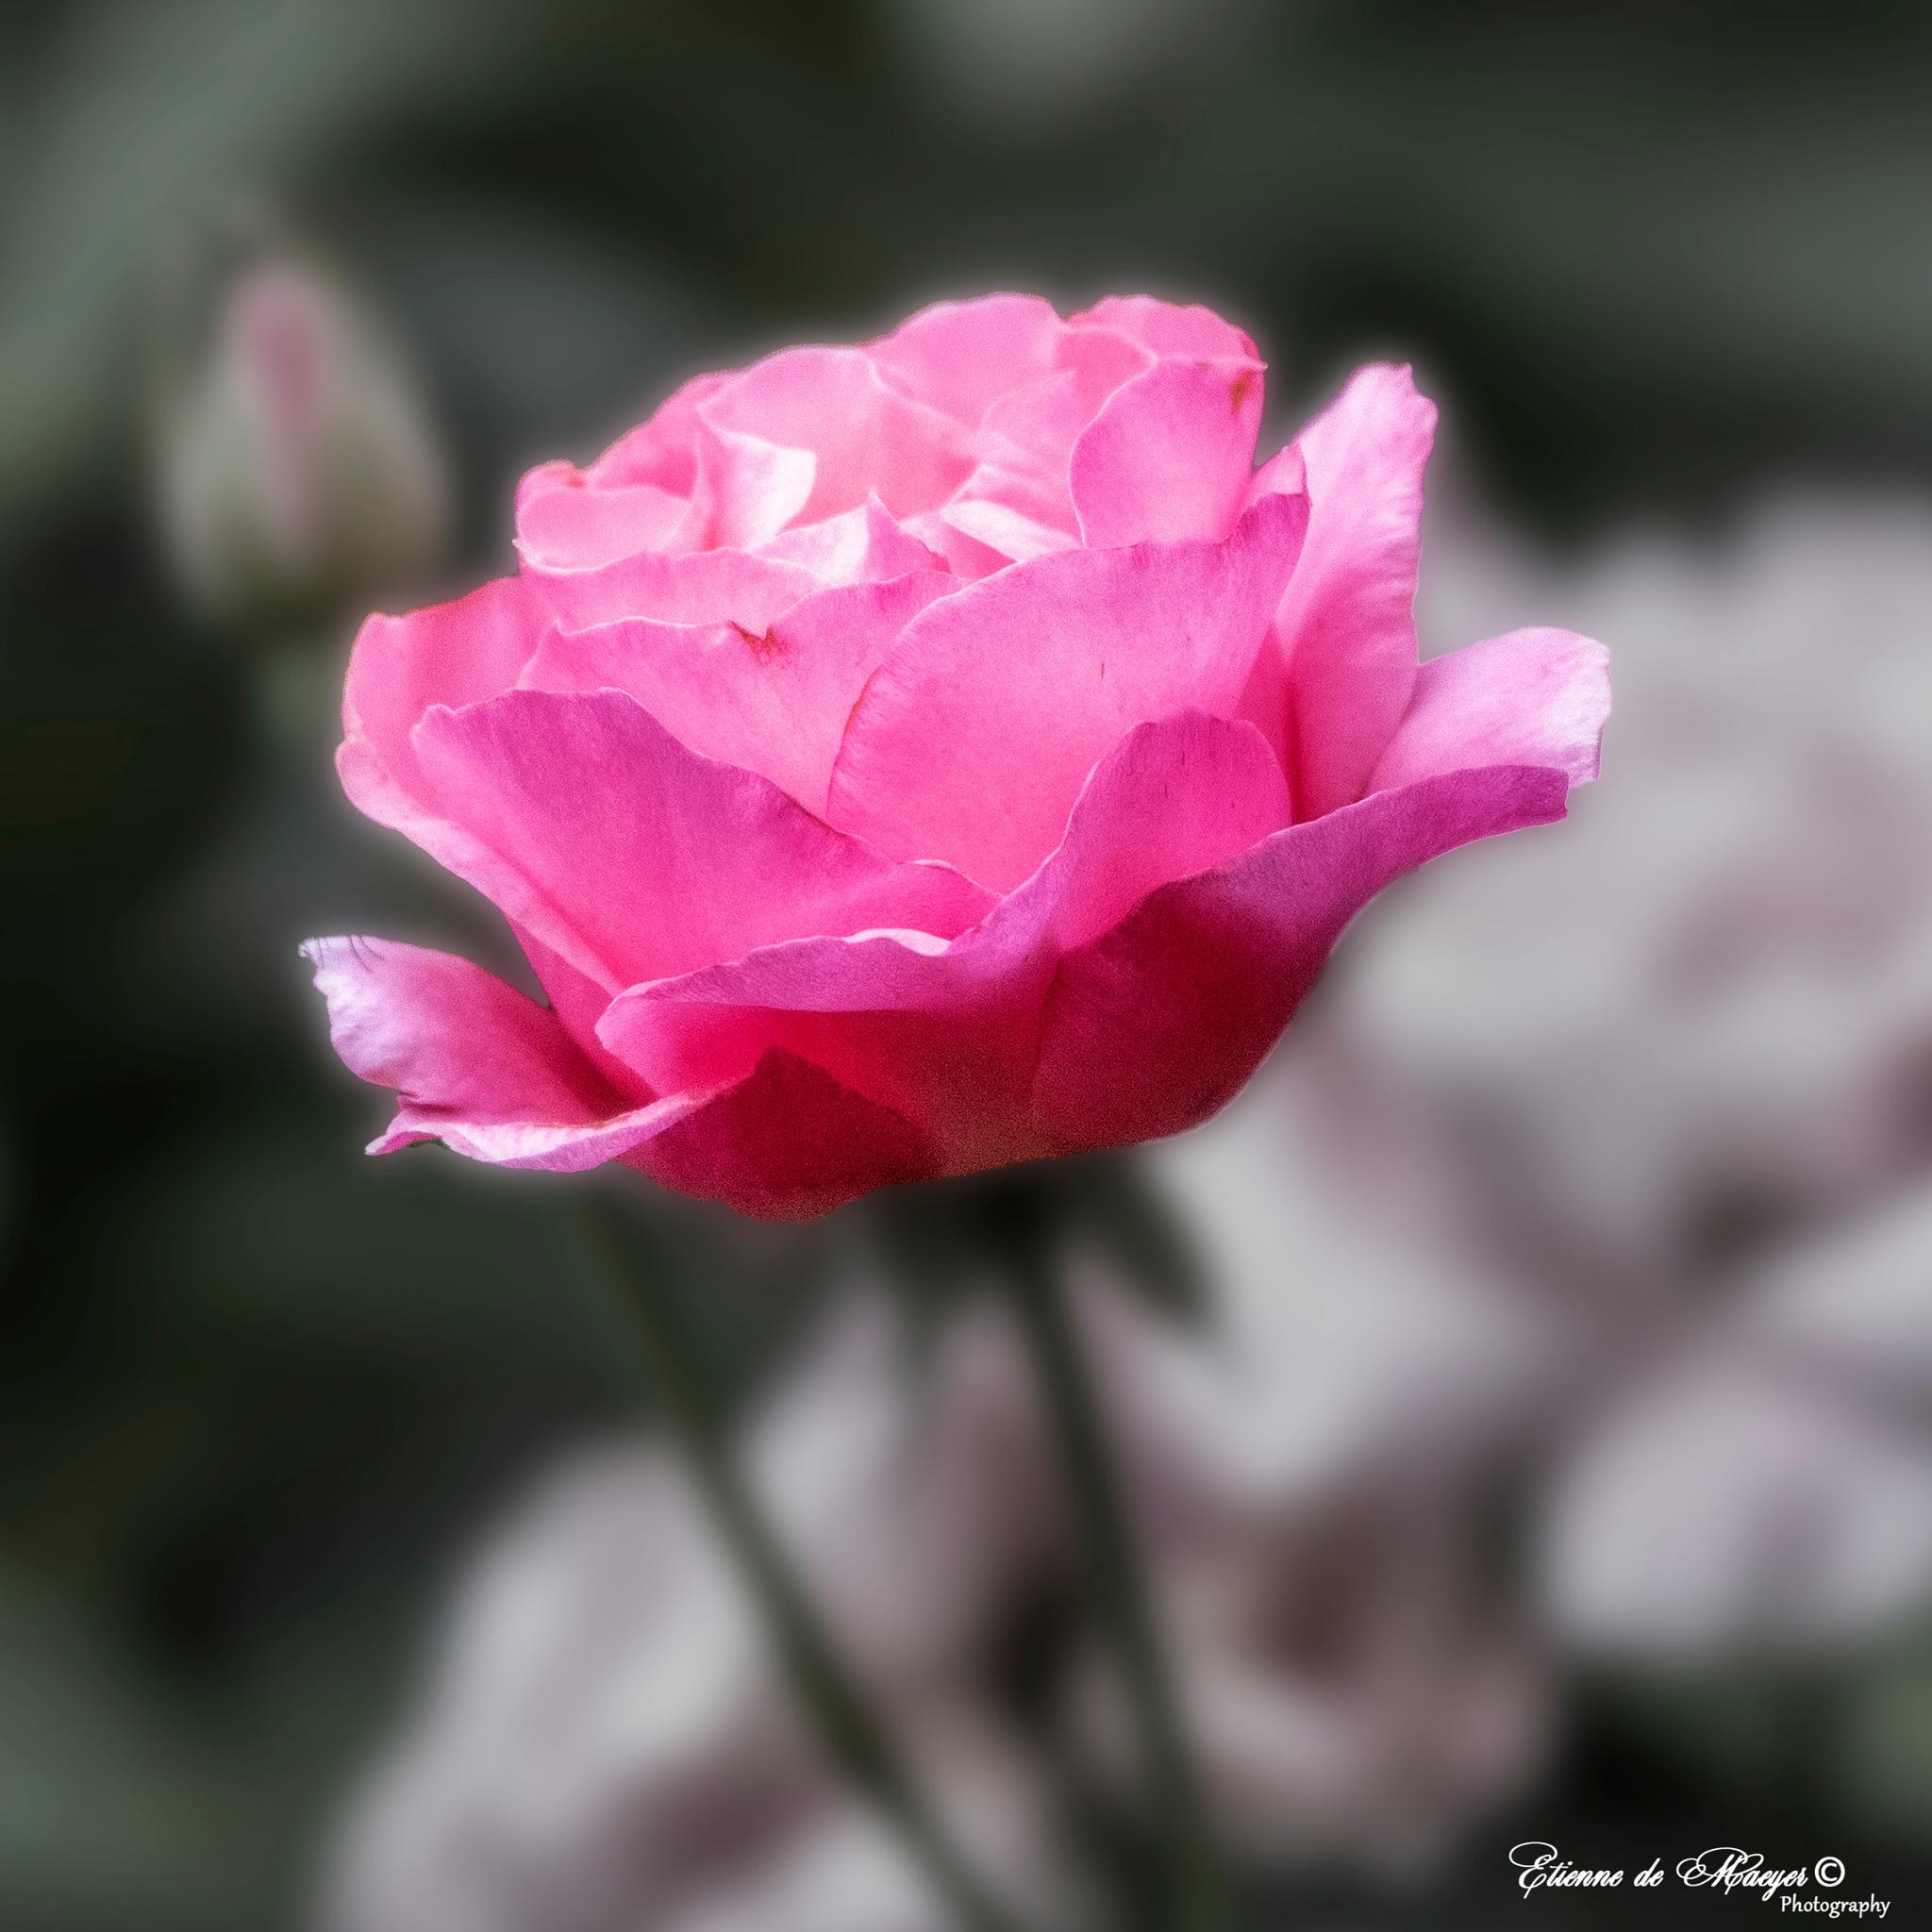 Pink Rose by Etienne de Maeyer